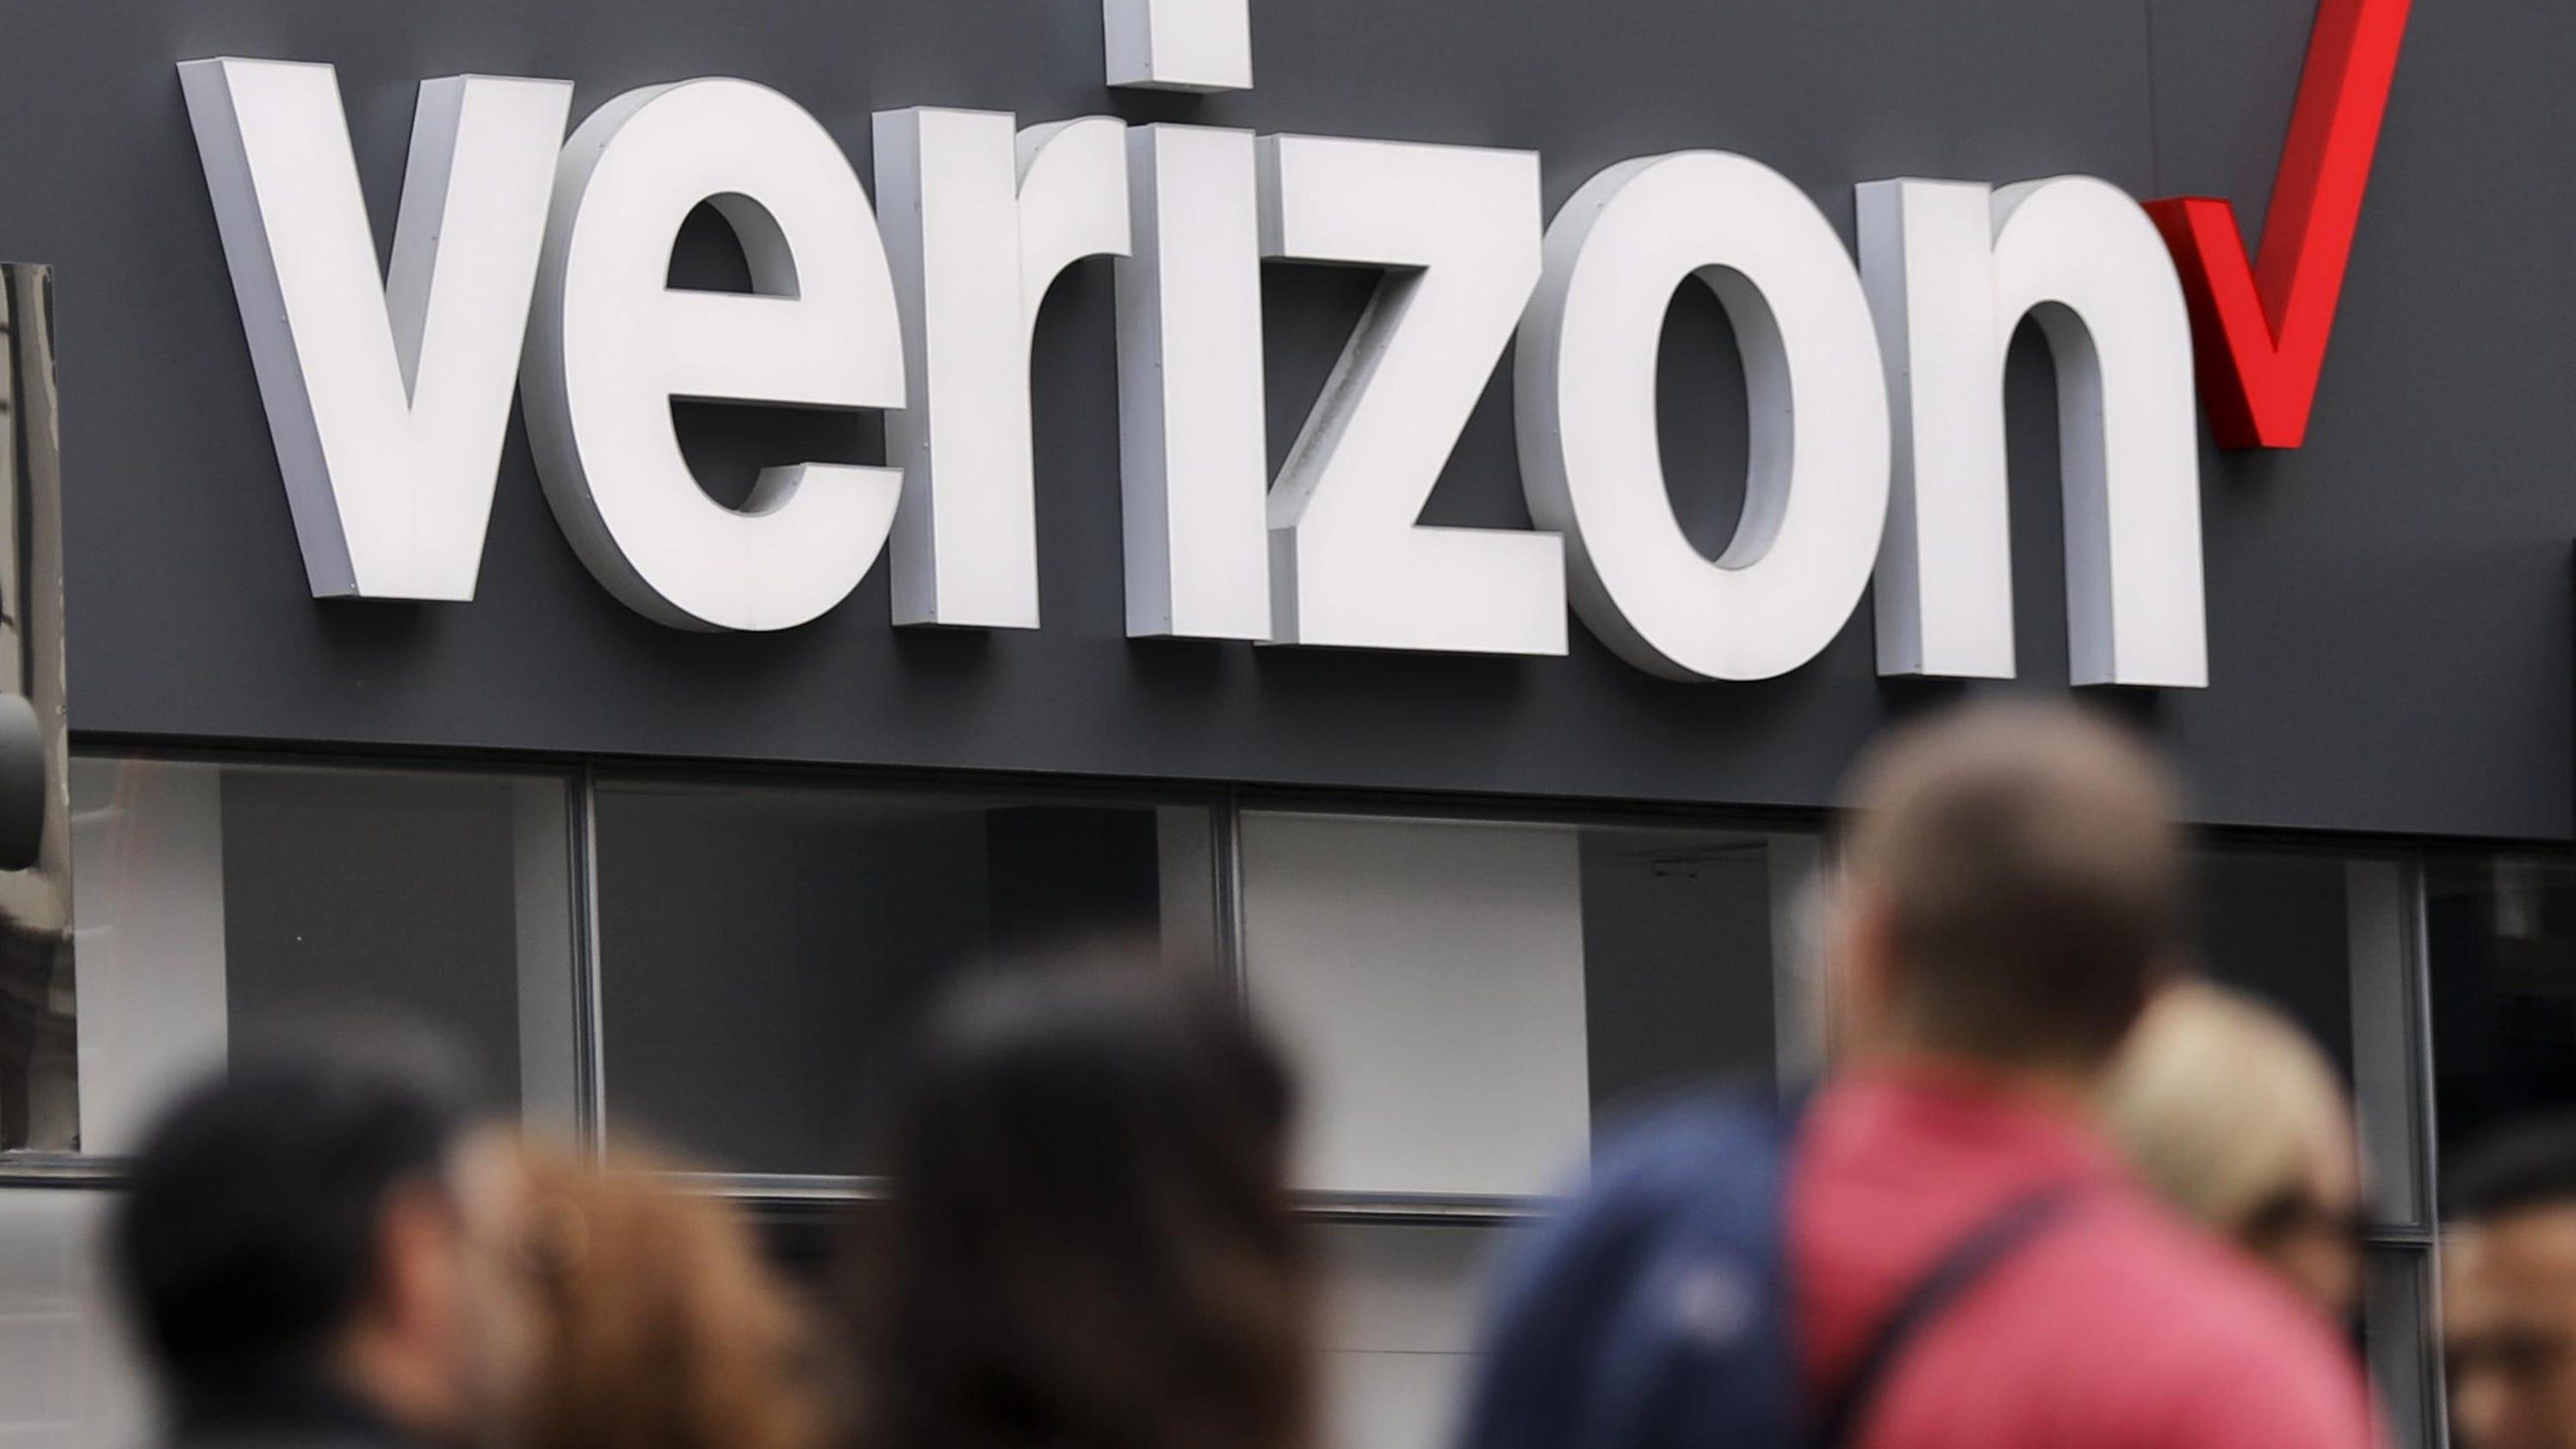 aaddbcc97624 cbsnews.com Verizon takes over Yahoo to complete  4.5B deal